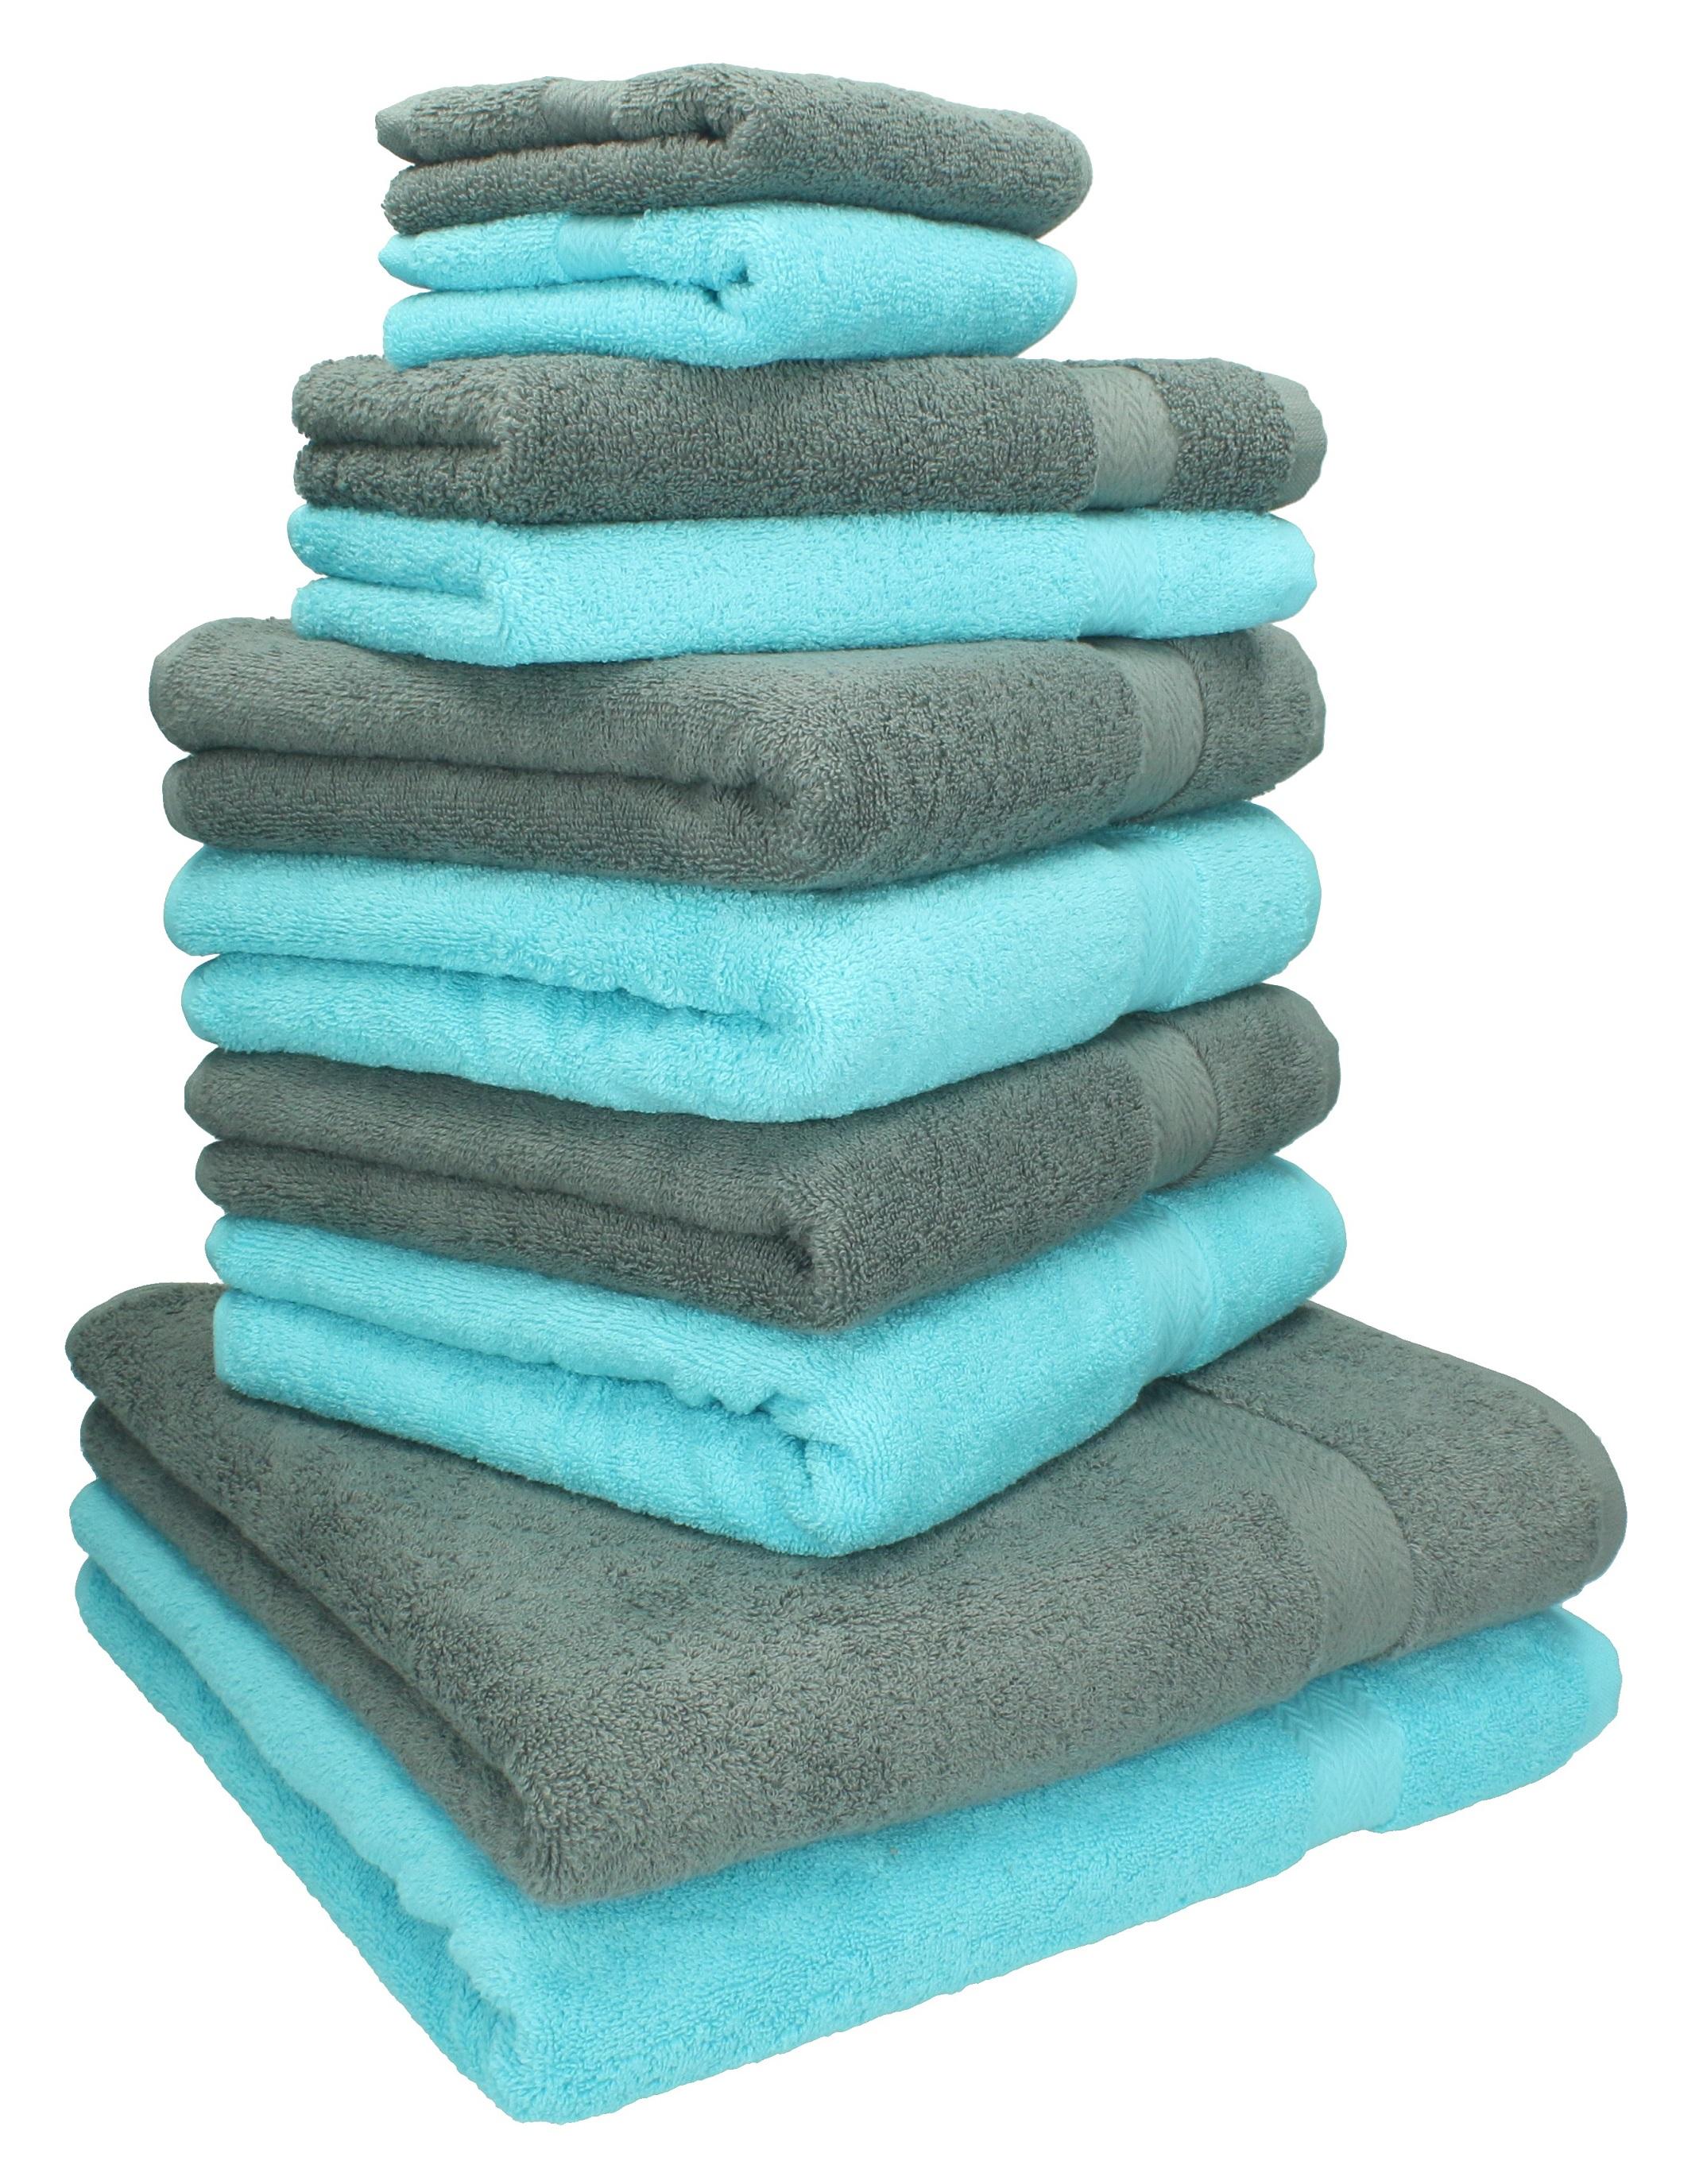 10 tlg handtuch set classic premium farbe t rkis anthrazit grau 2 seift ebay. Black Bedroom Furniture Sets. Home Design Ideas